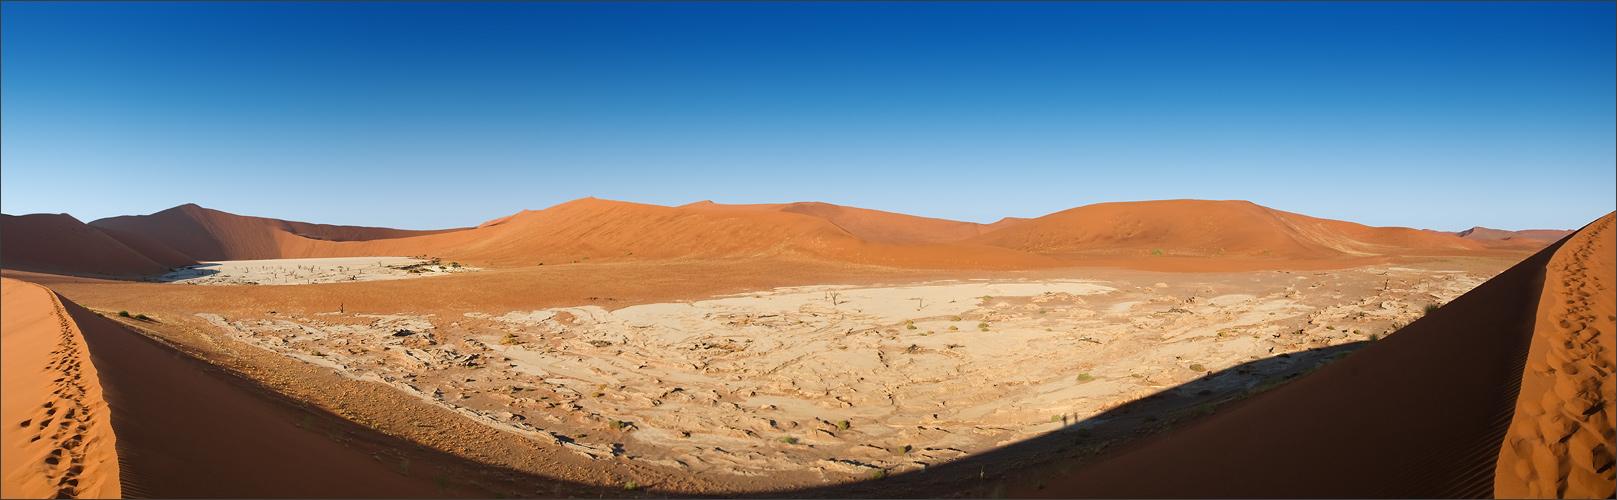 Namibia XI - Vlei Panorama 180°